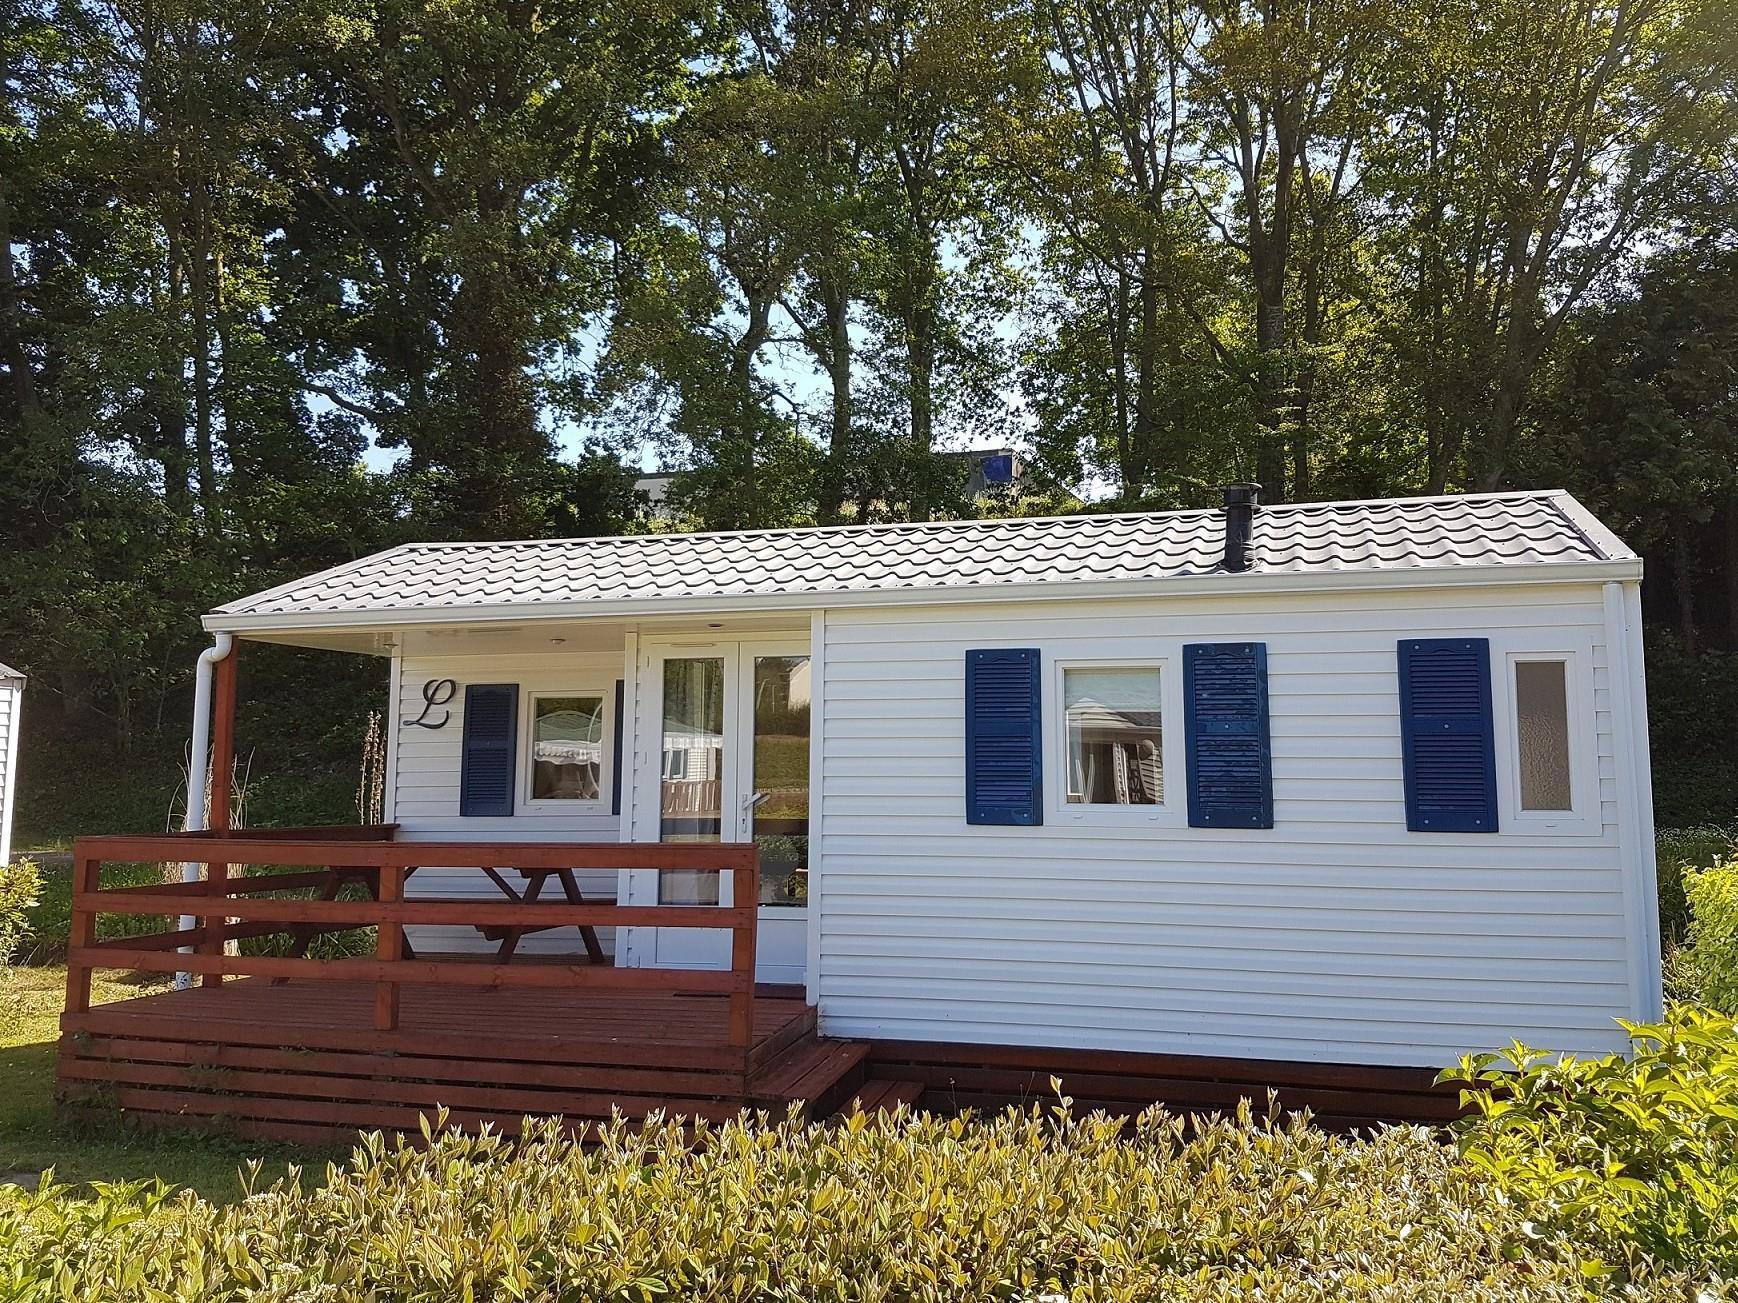 Location - Mobil-Home Standard 25M² - 2 Chambres + Terrasse Intégrée - Camping des Vallées